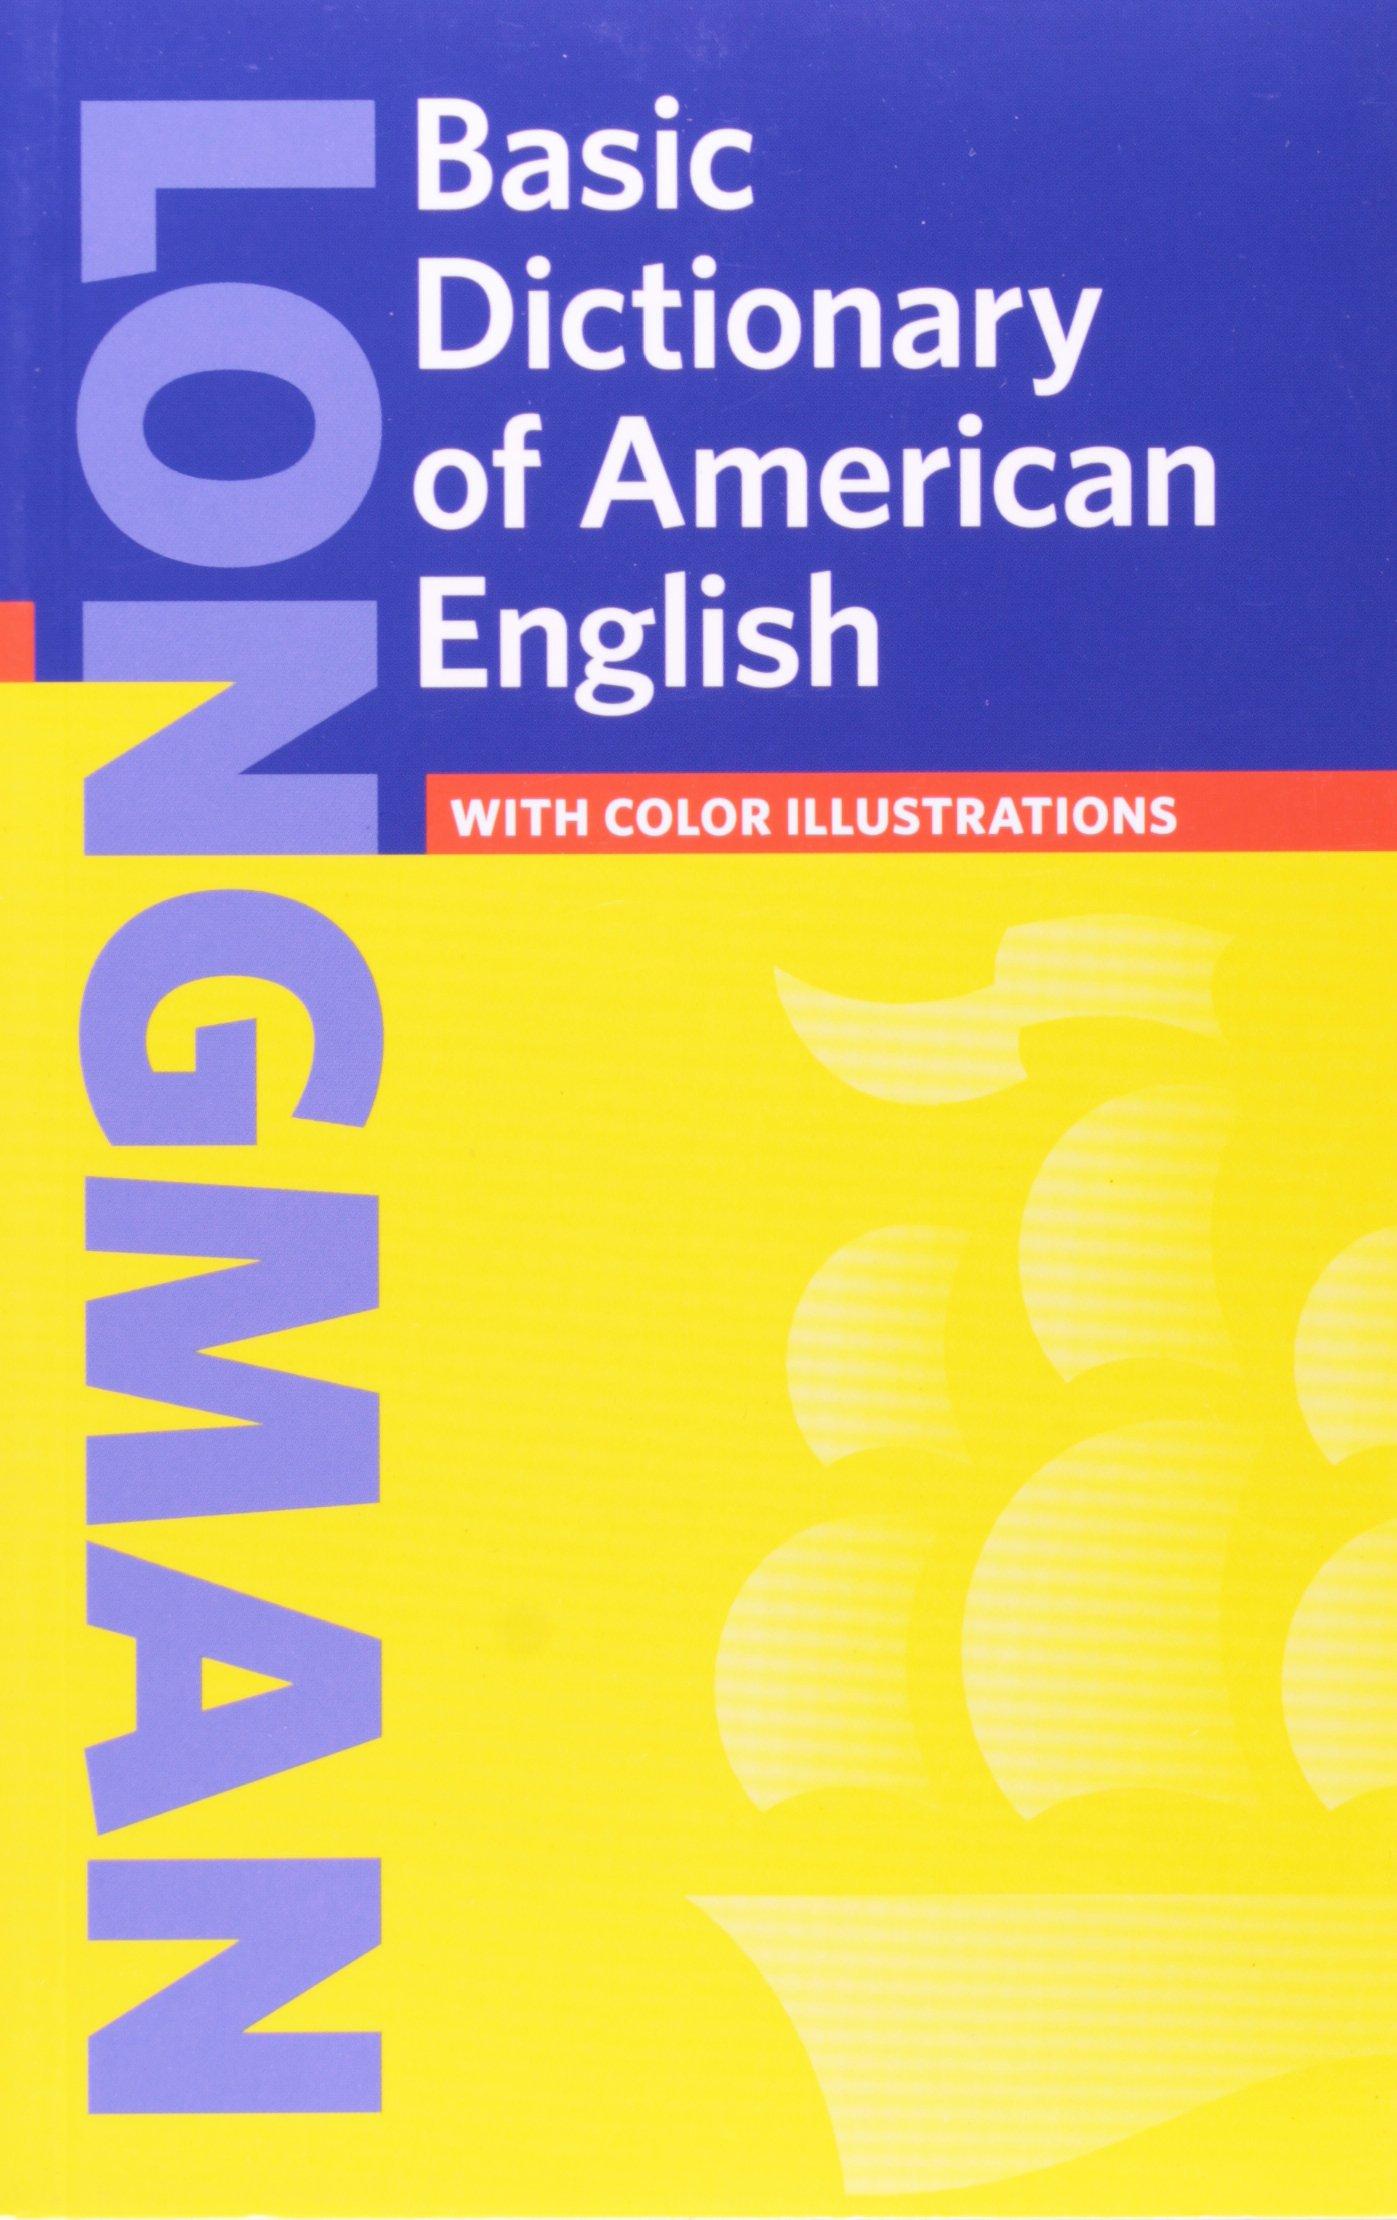 Amazon.com: Longman Basic Dictionary of American English (2nd Edition)  (9780582332515): Pearson Education: Books